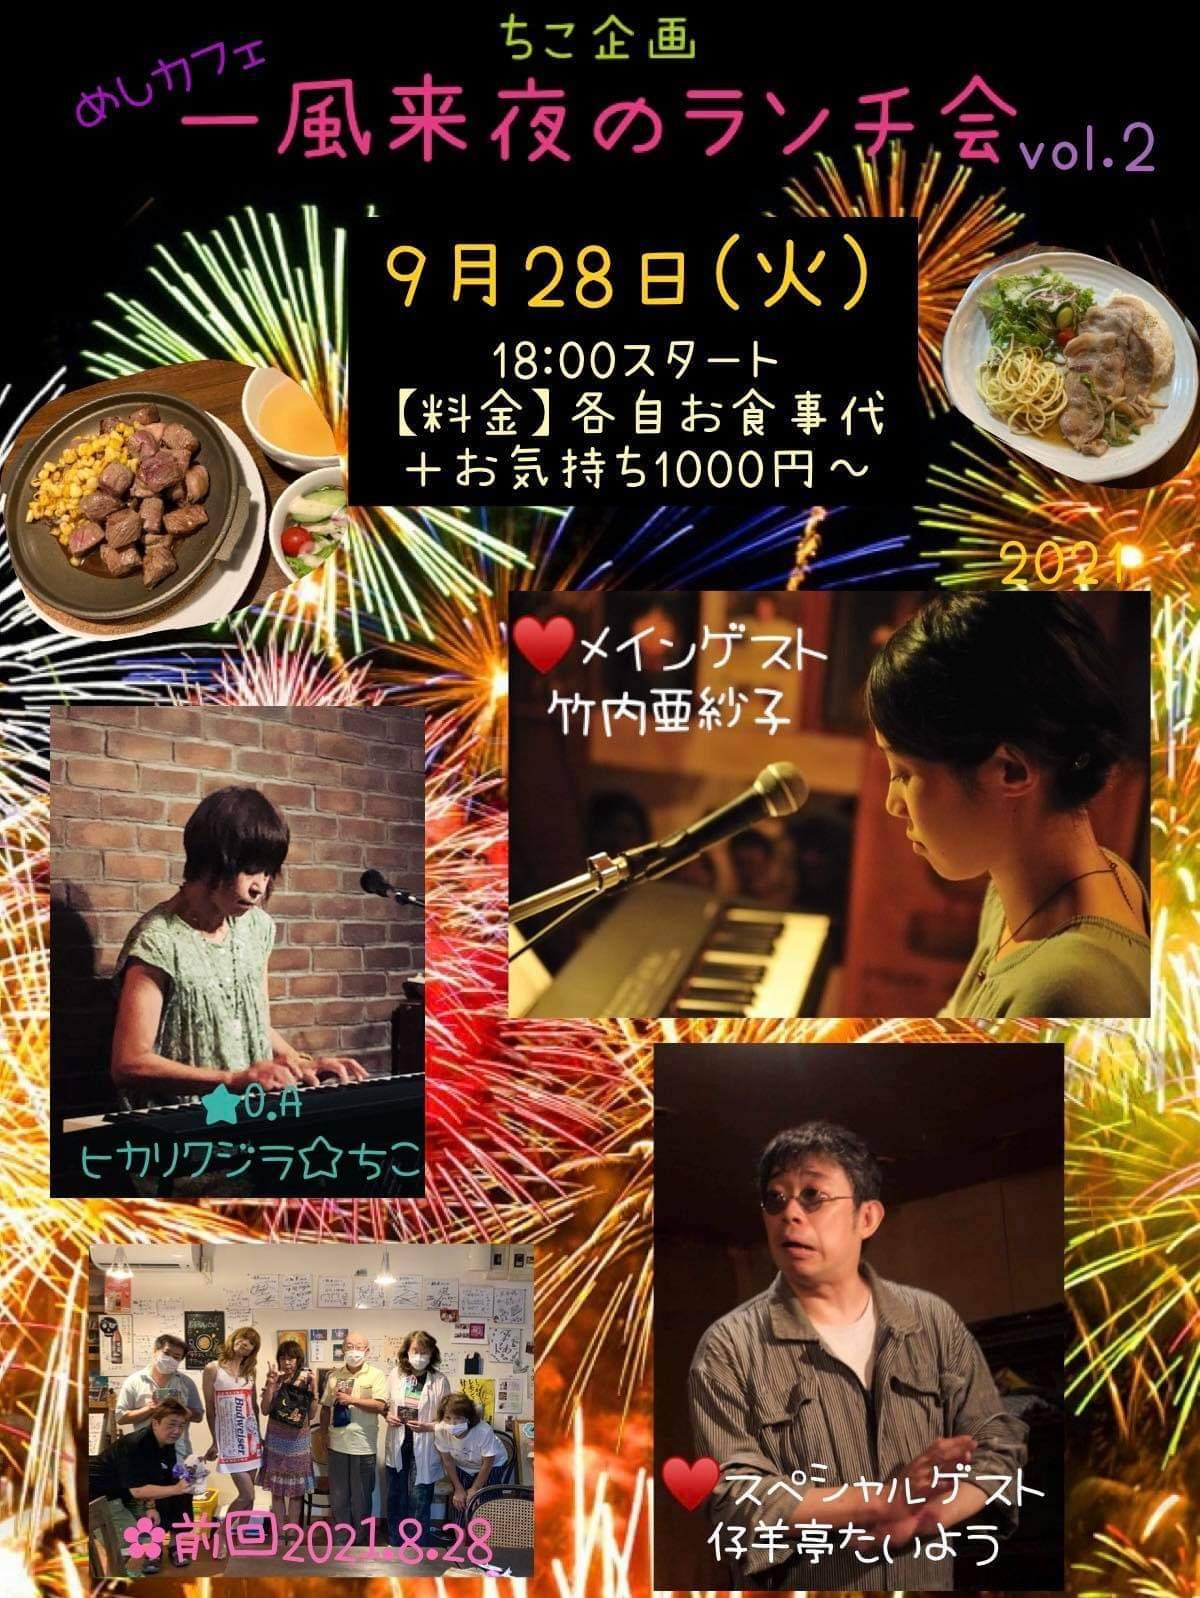 "<span class=""title"">2021年9月28日(火)めしカフェ 一風来(北海道)</span>"